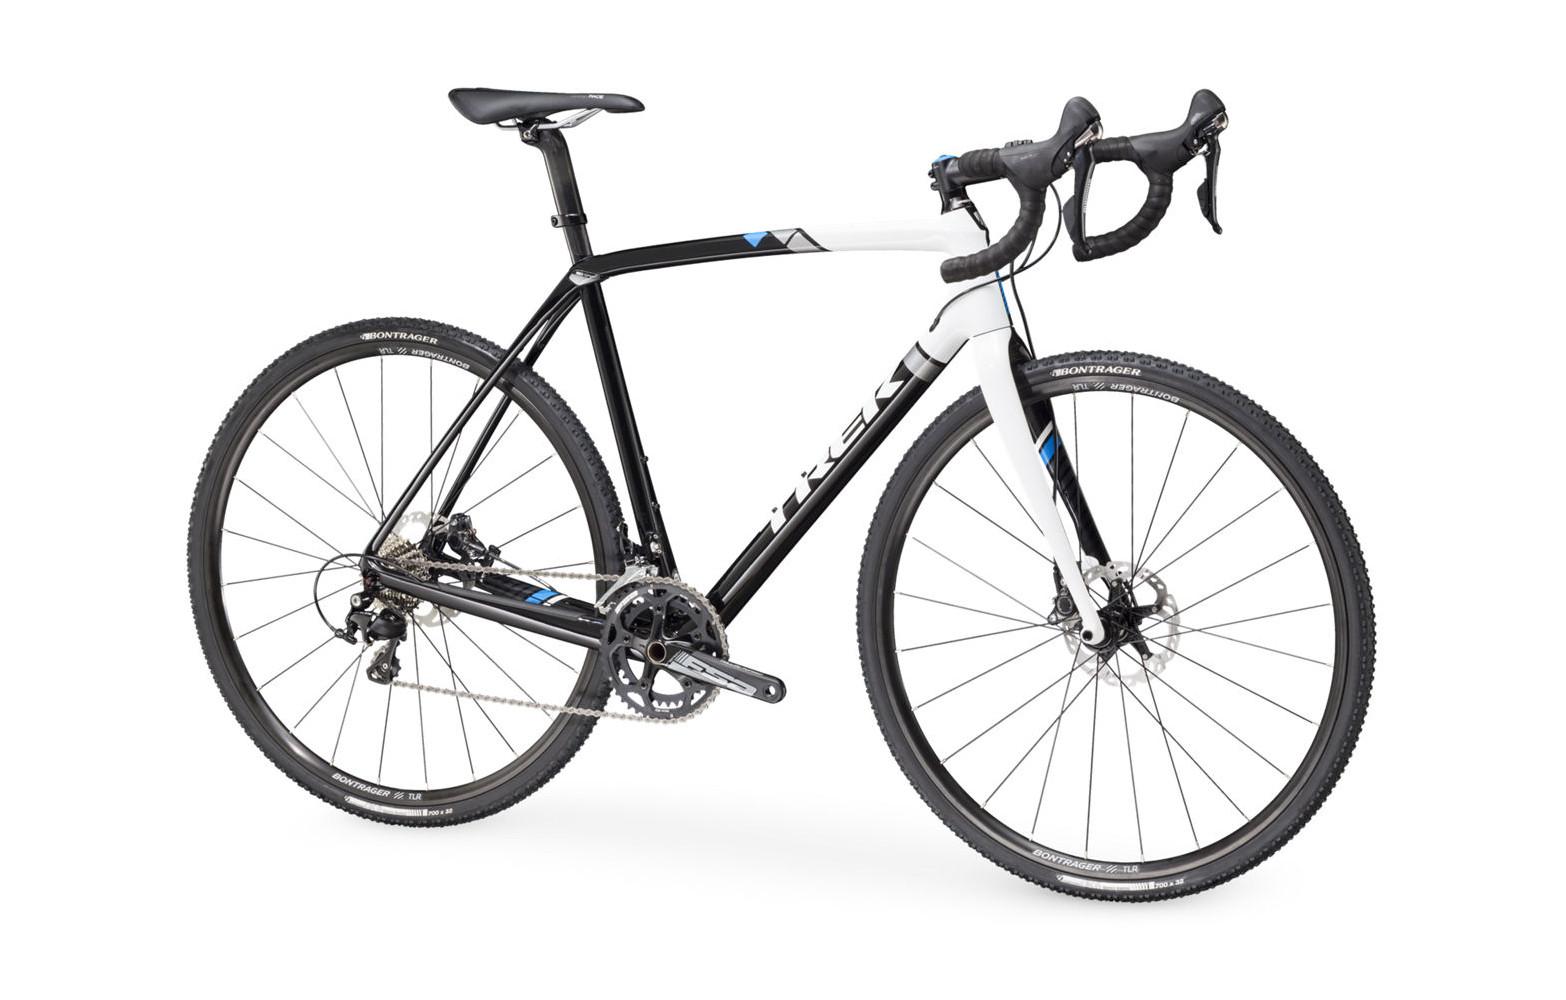 trek complete cyclo cross bike boone 5 disc carbone black. Black Bedroom Furniture Sets. Home Design Ideas